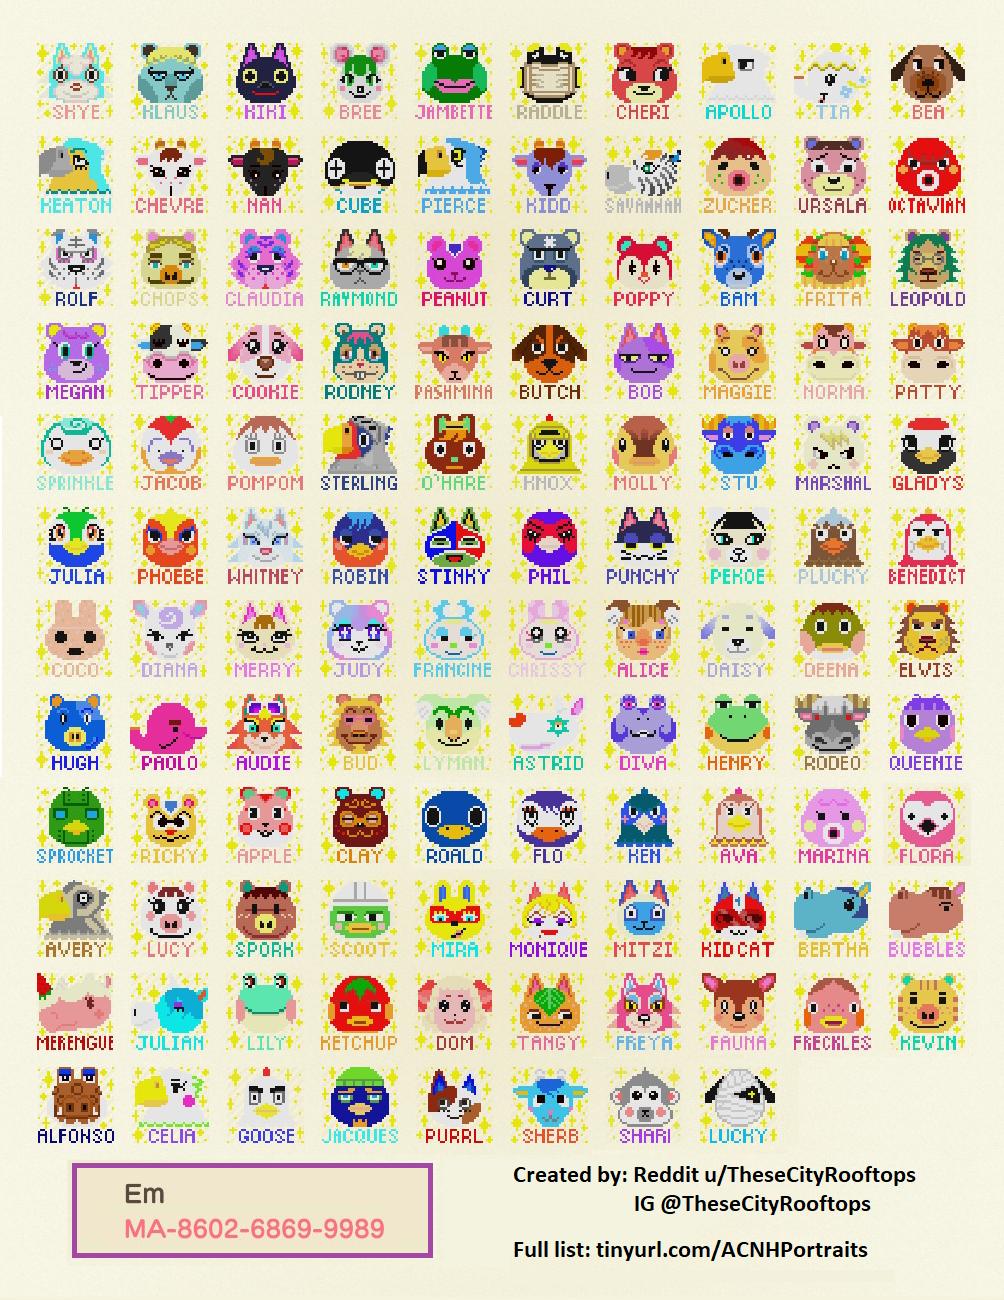 qr-closet:all 391 villager portraits with names 🎉